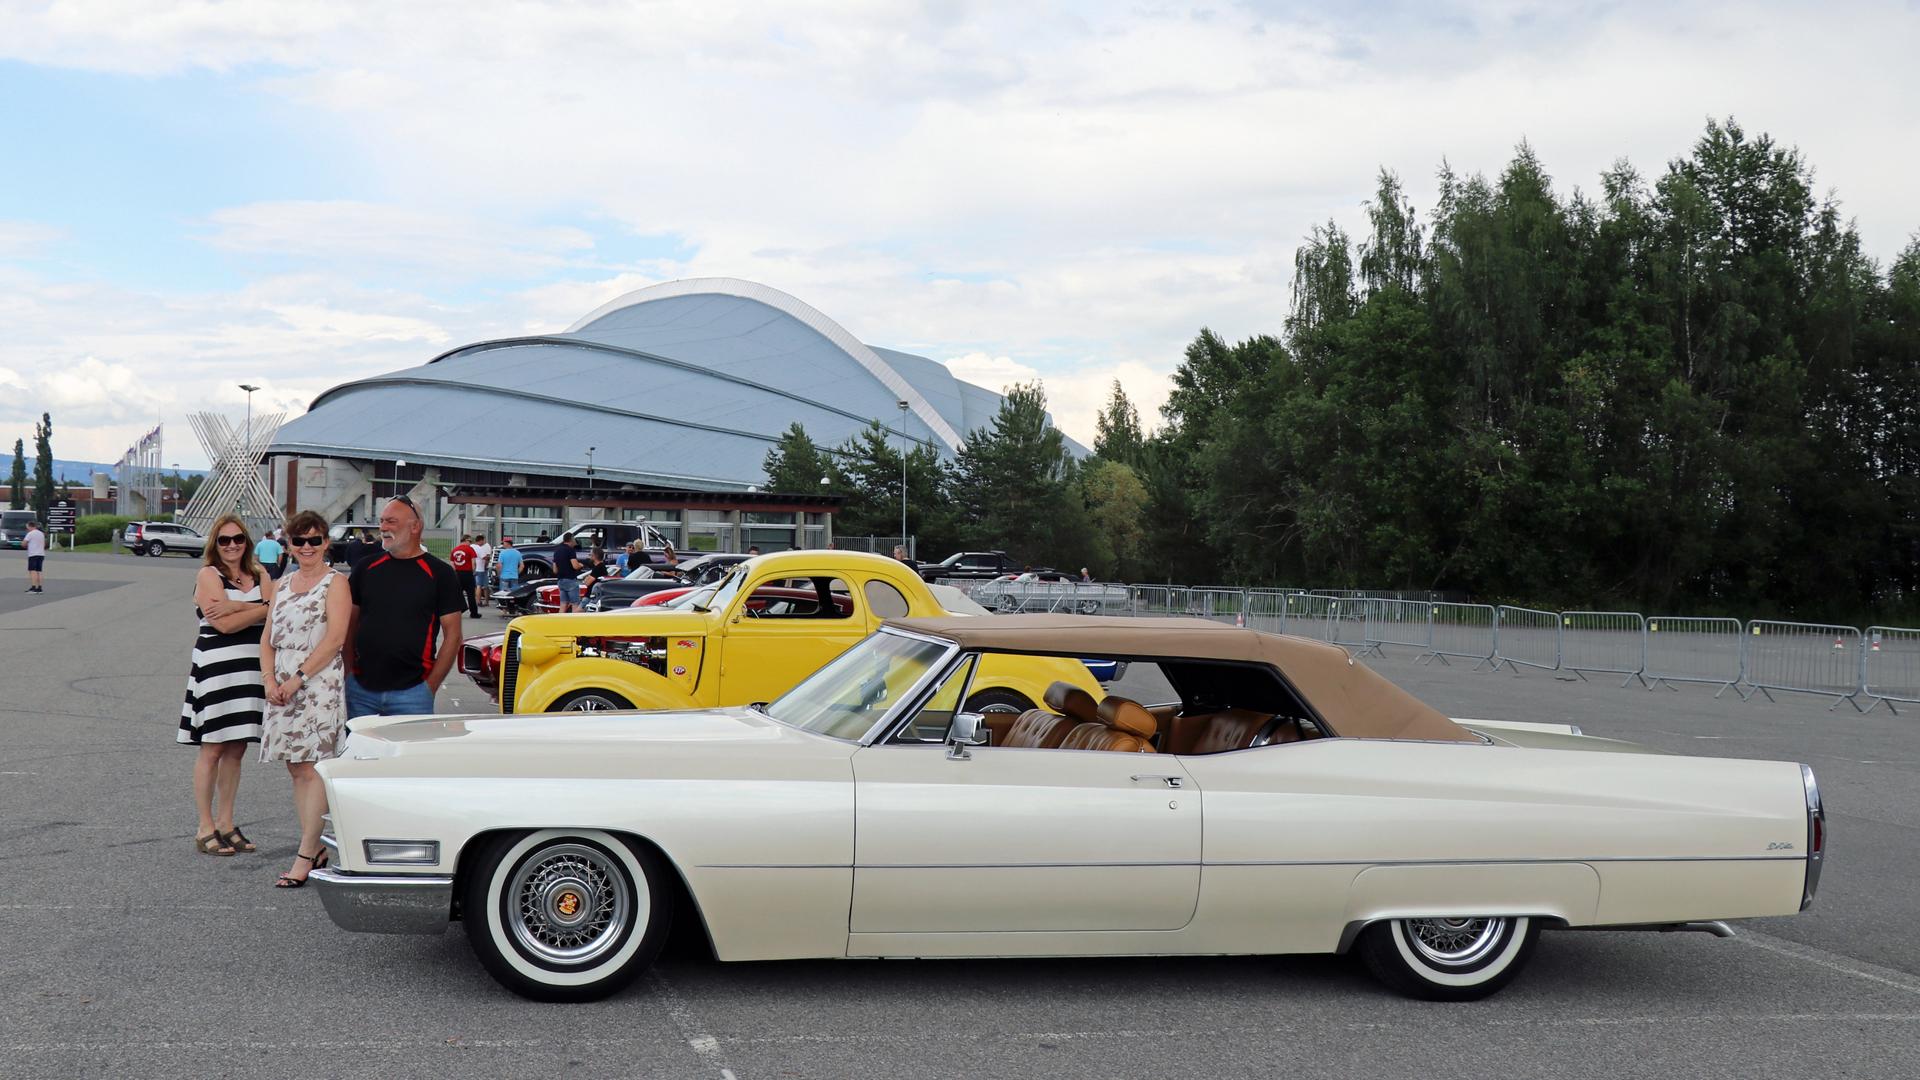 070-1968 Cadillac DeVille convertible 03, Eiere, 0